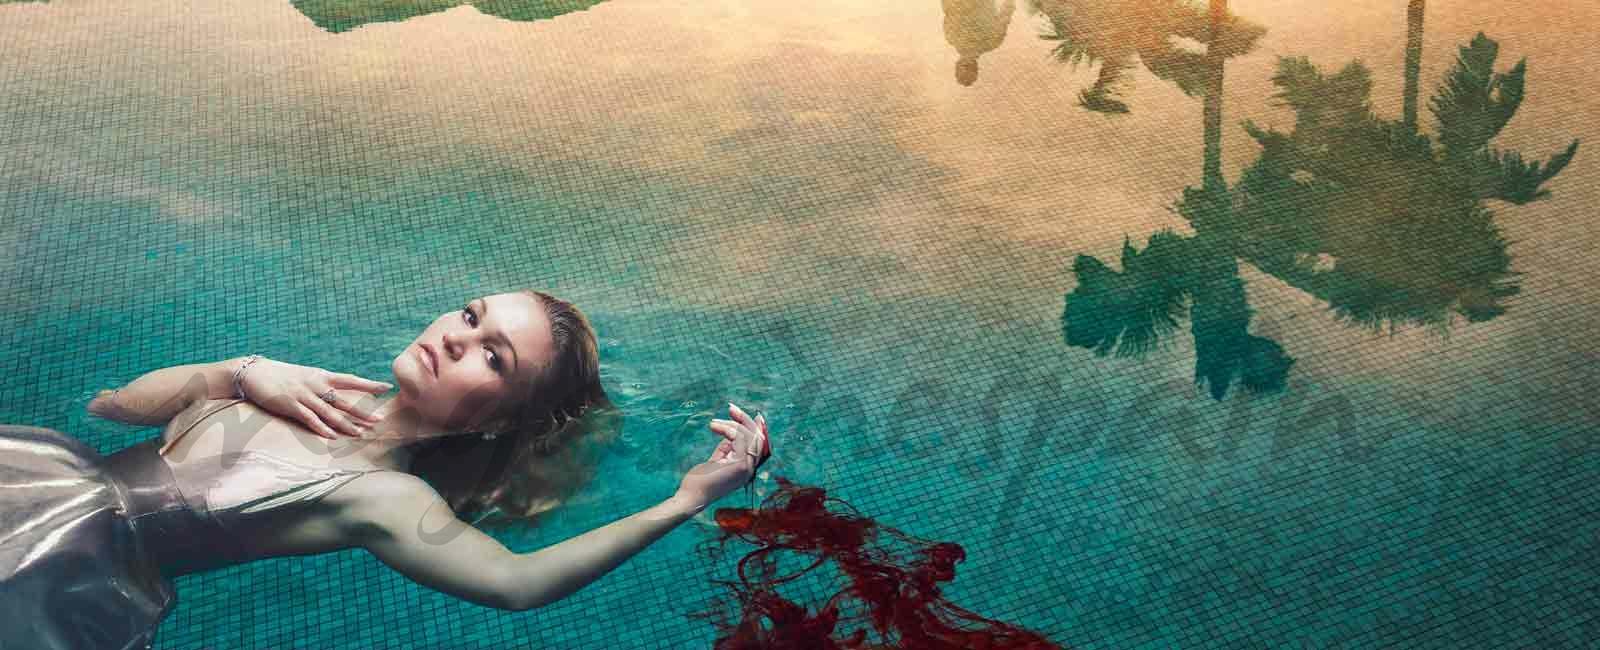 Estreno de «Riviera», serie protagonizada por Julia Stiles